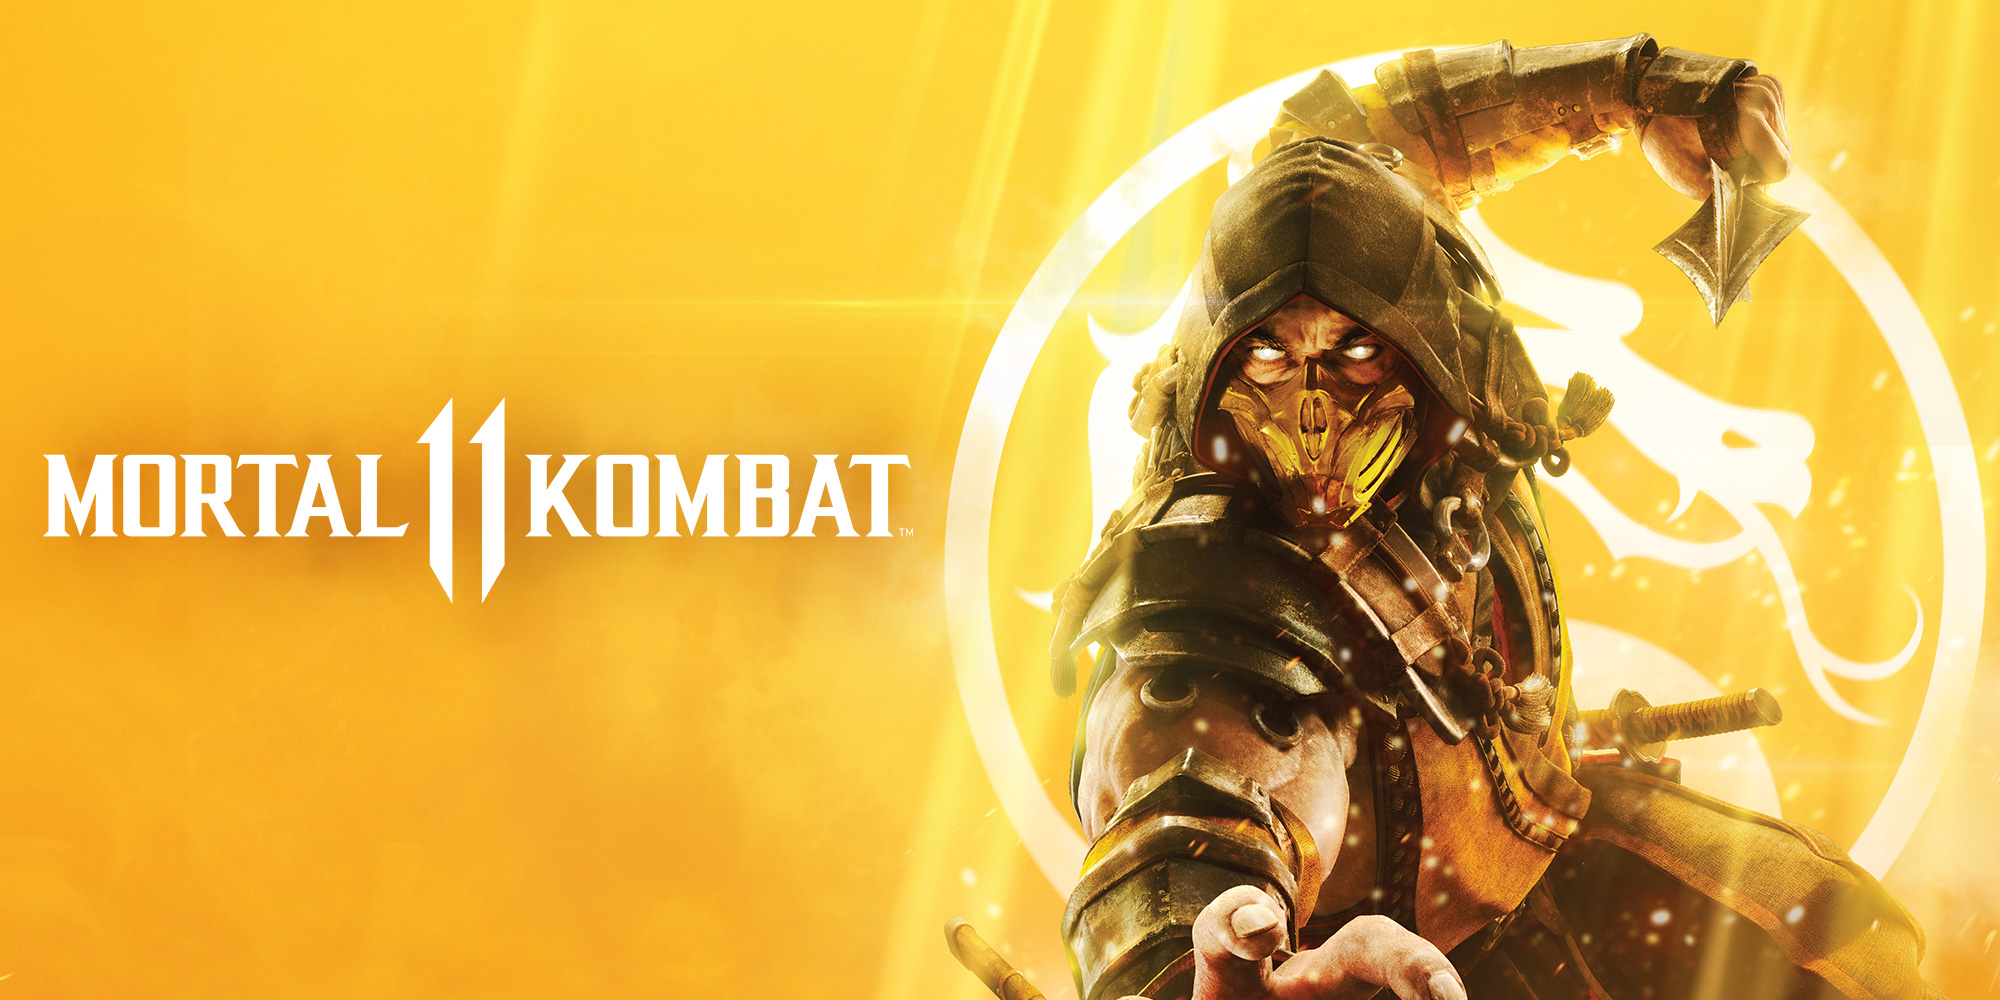 Mortal Kombat 11 v09.29.2020 + All DLCs - Download